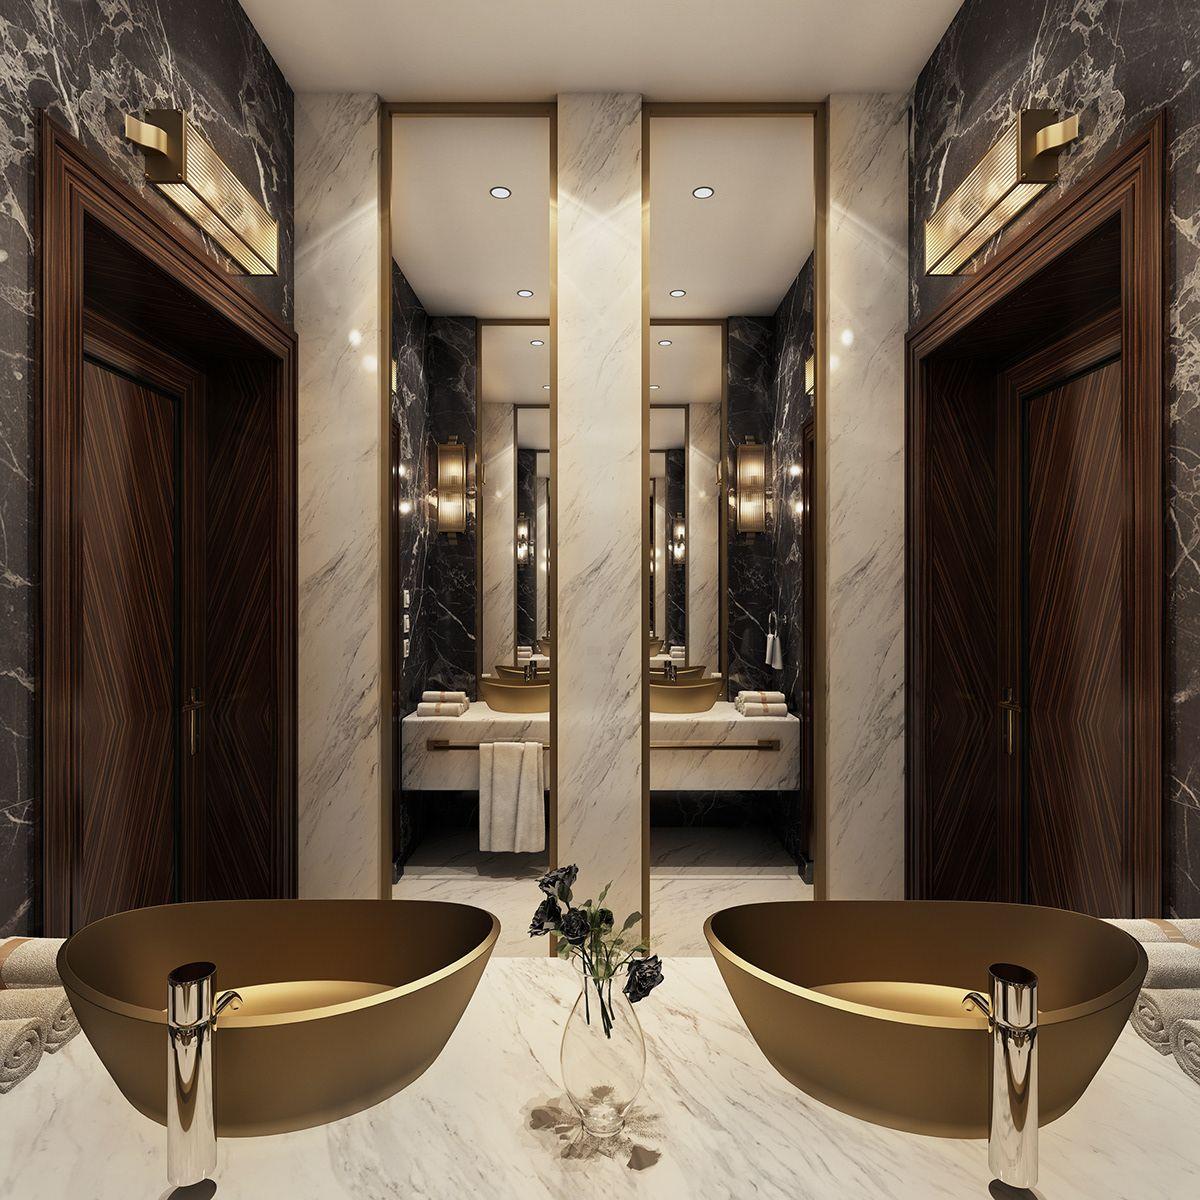 Modern Luxury Bathroom on Behance (With images) | Modern ...